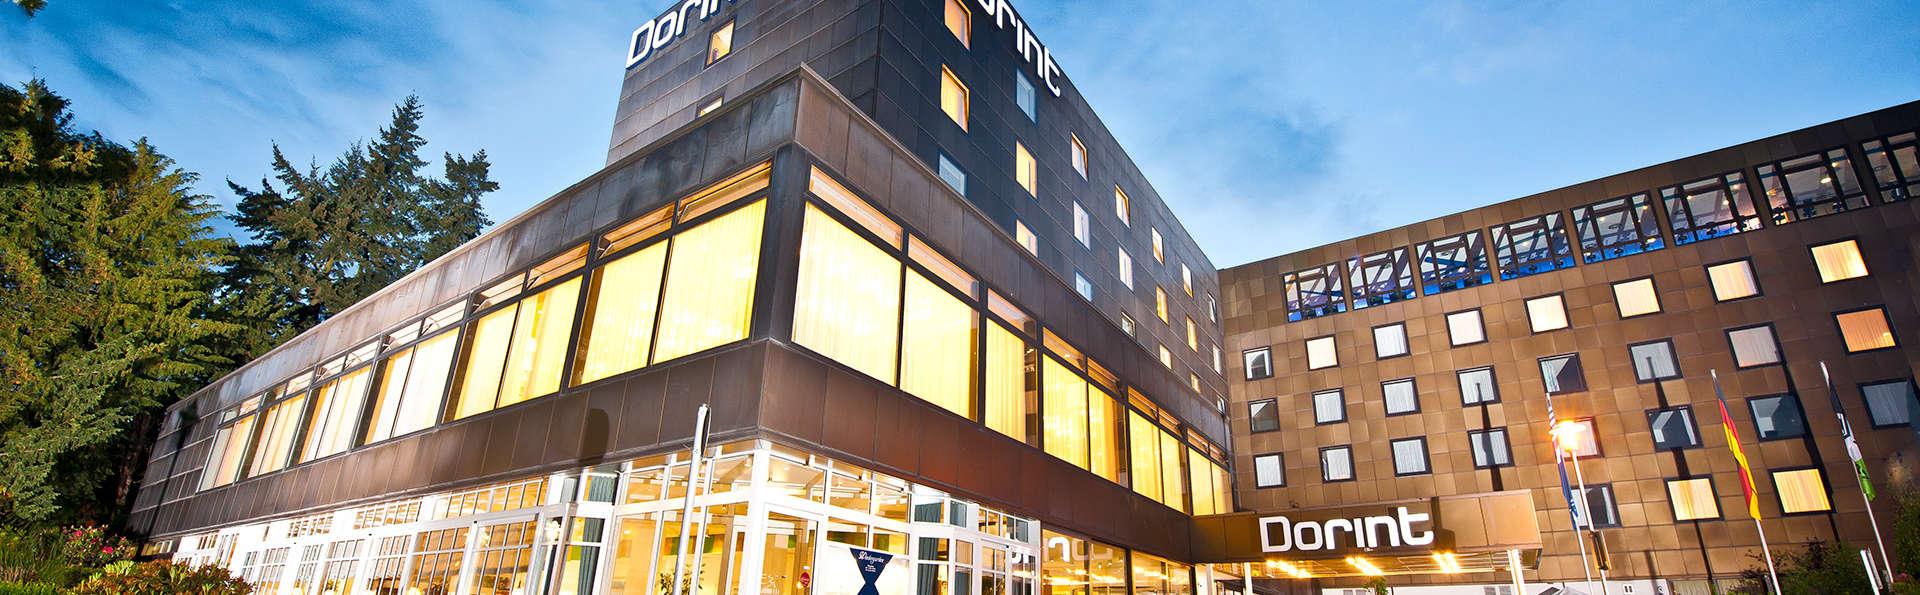 Dorint Parkhotel Mönchengladbach - Edit_Front2.jpg